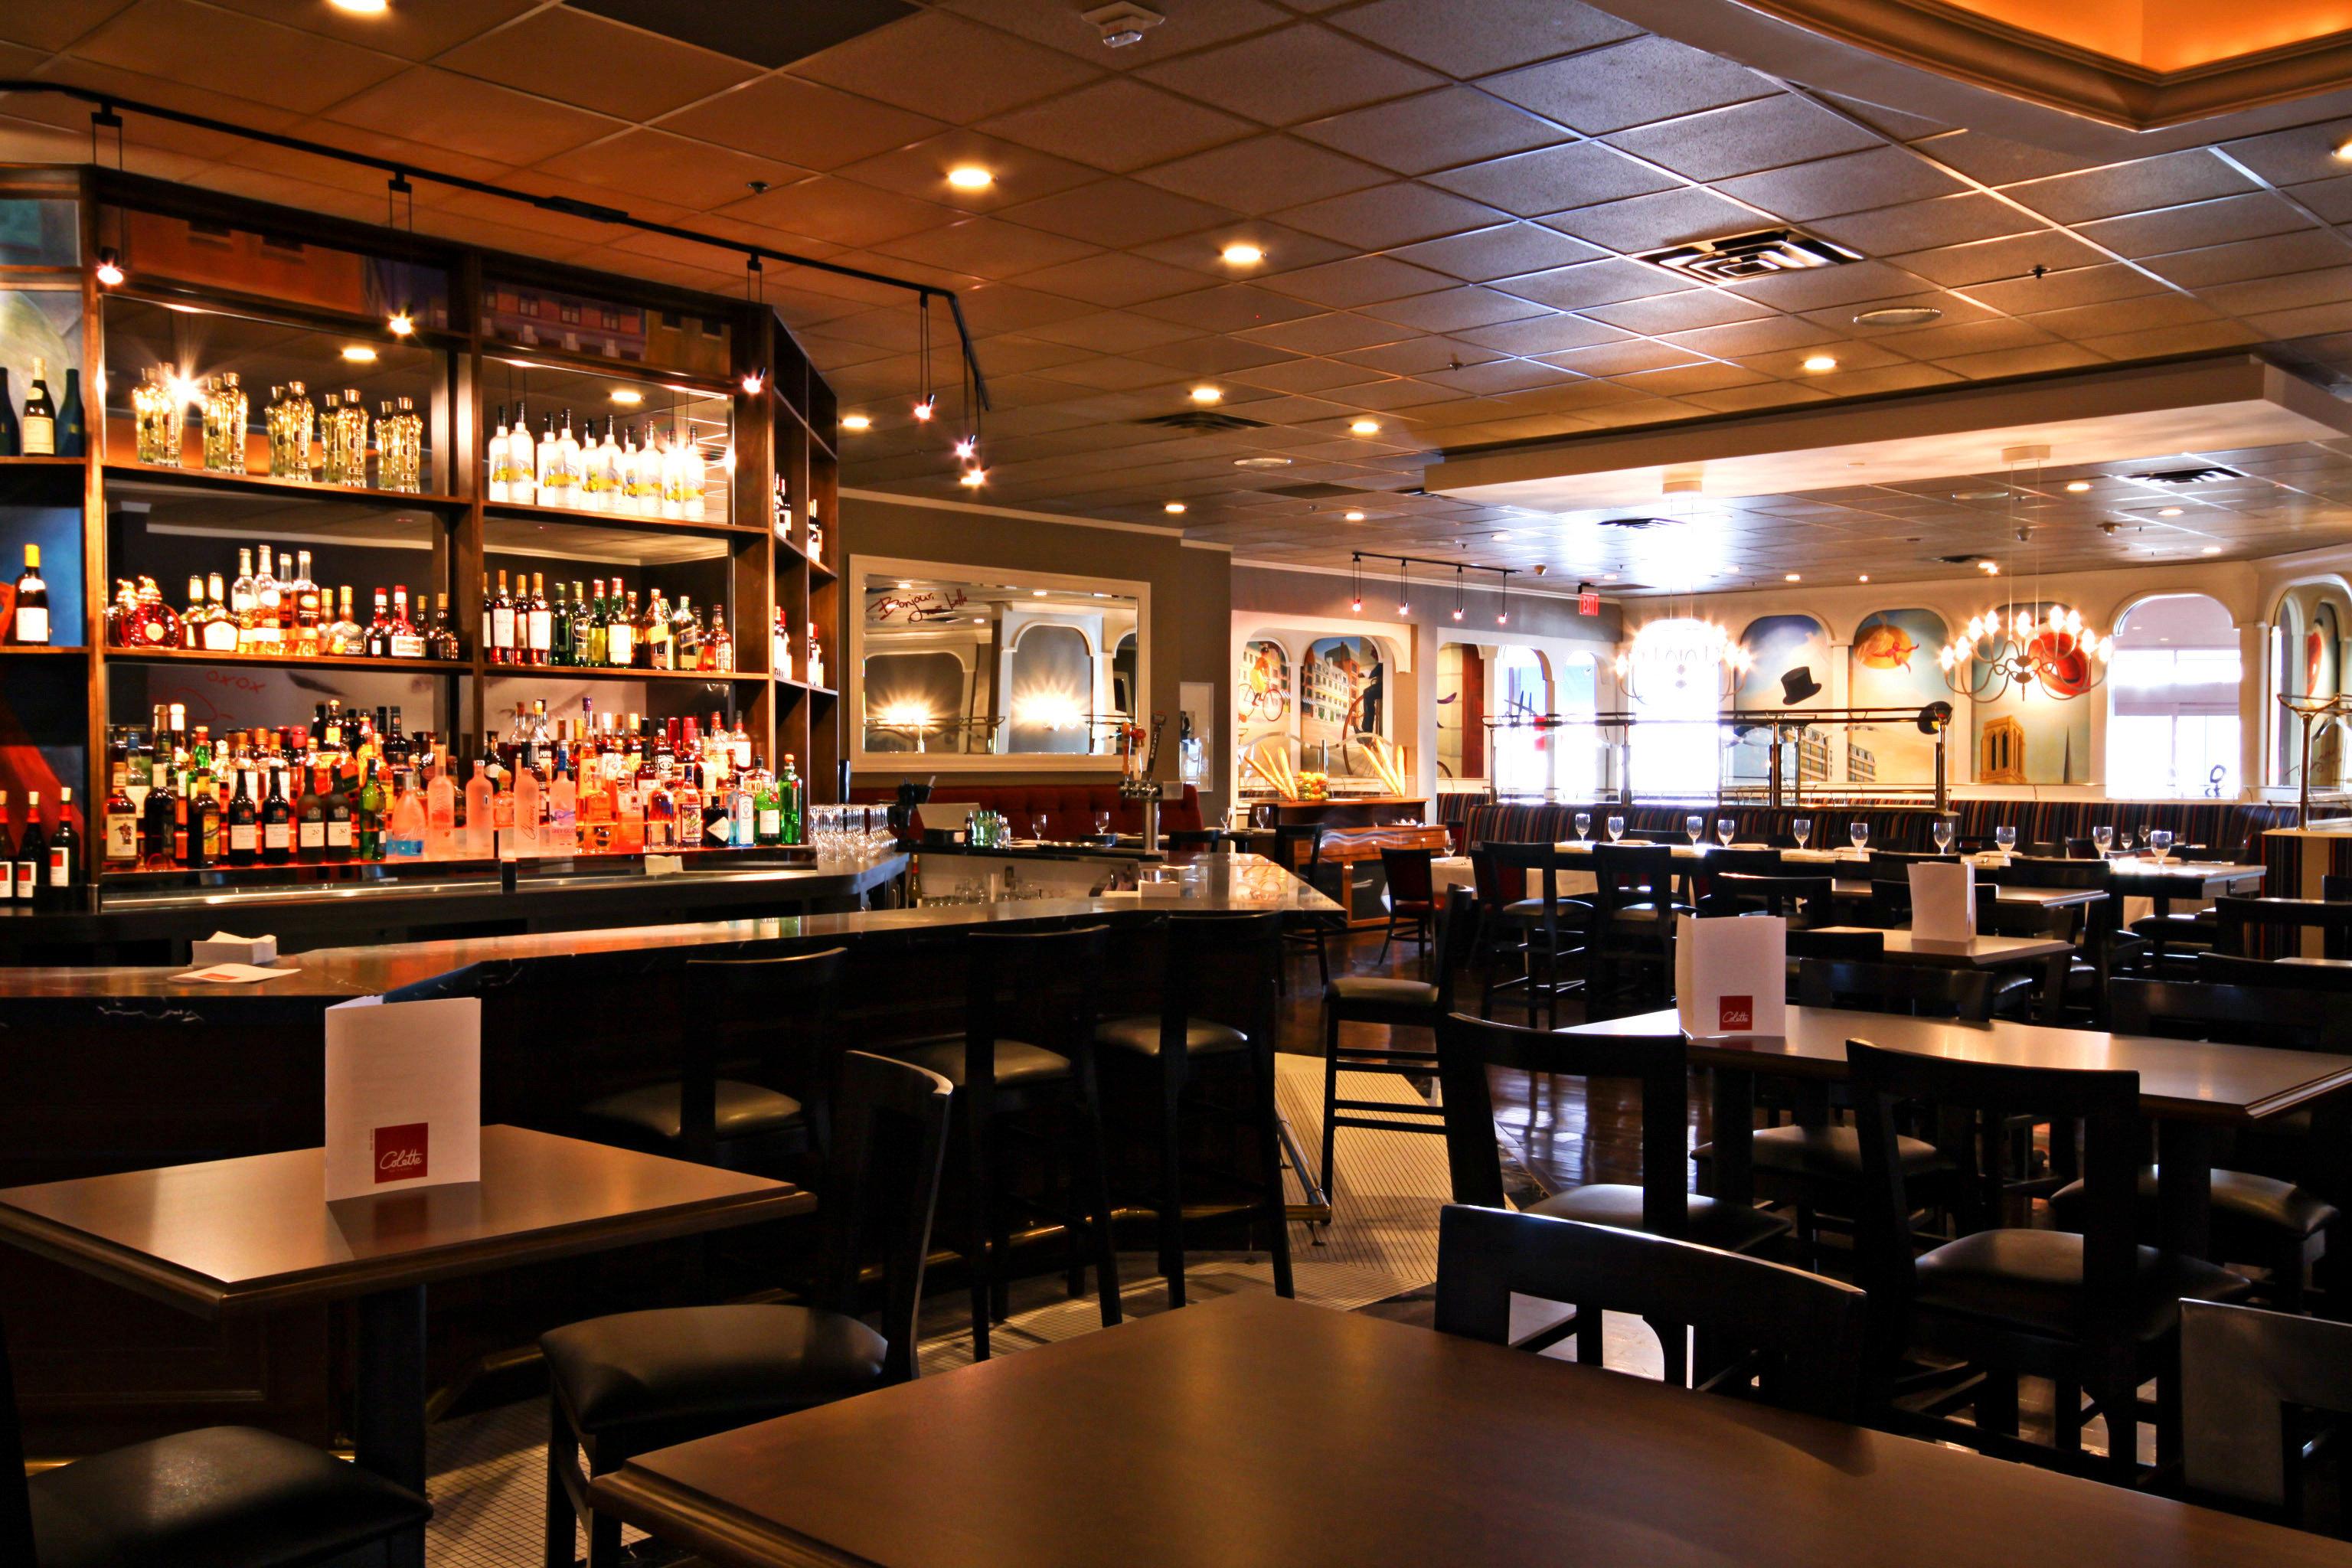 Bar Classic Dining Drink Eat Modern restaurant café food court